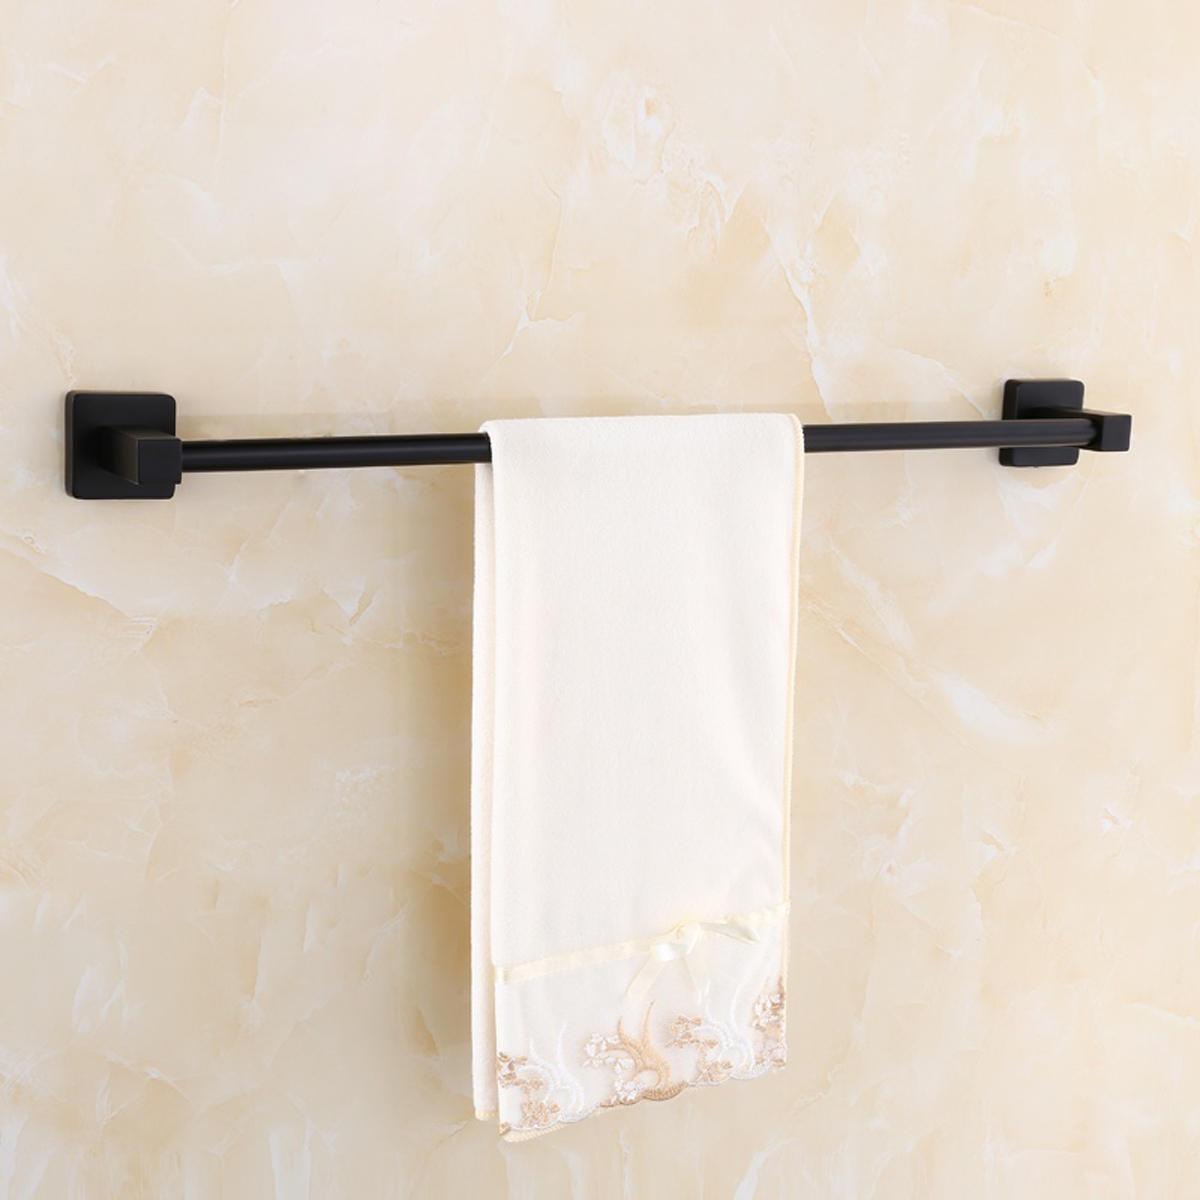 Matt Black Square Toalla Holder Rack Cuarto de baño Shower Toilet Wall Mount Clothes Bar Rail Percha